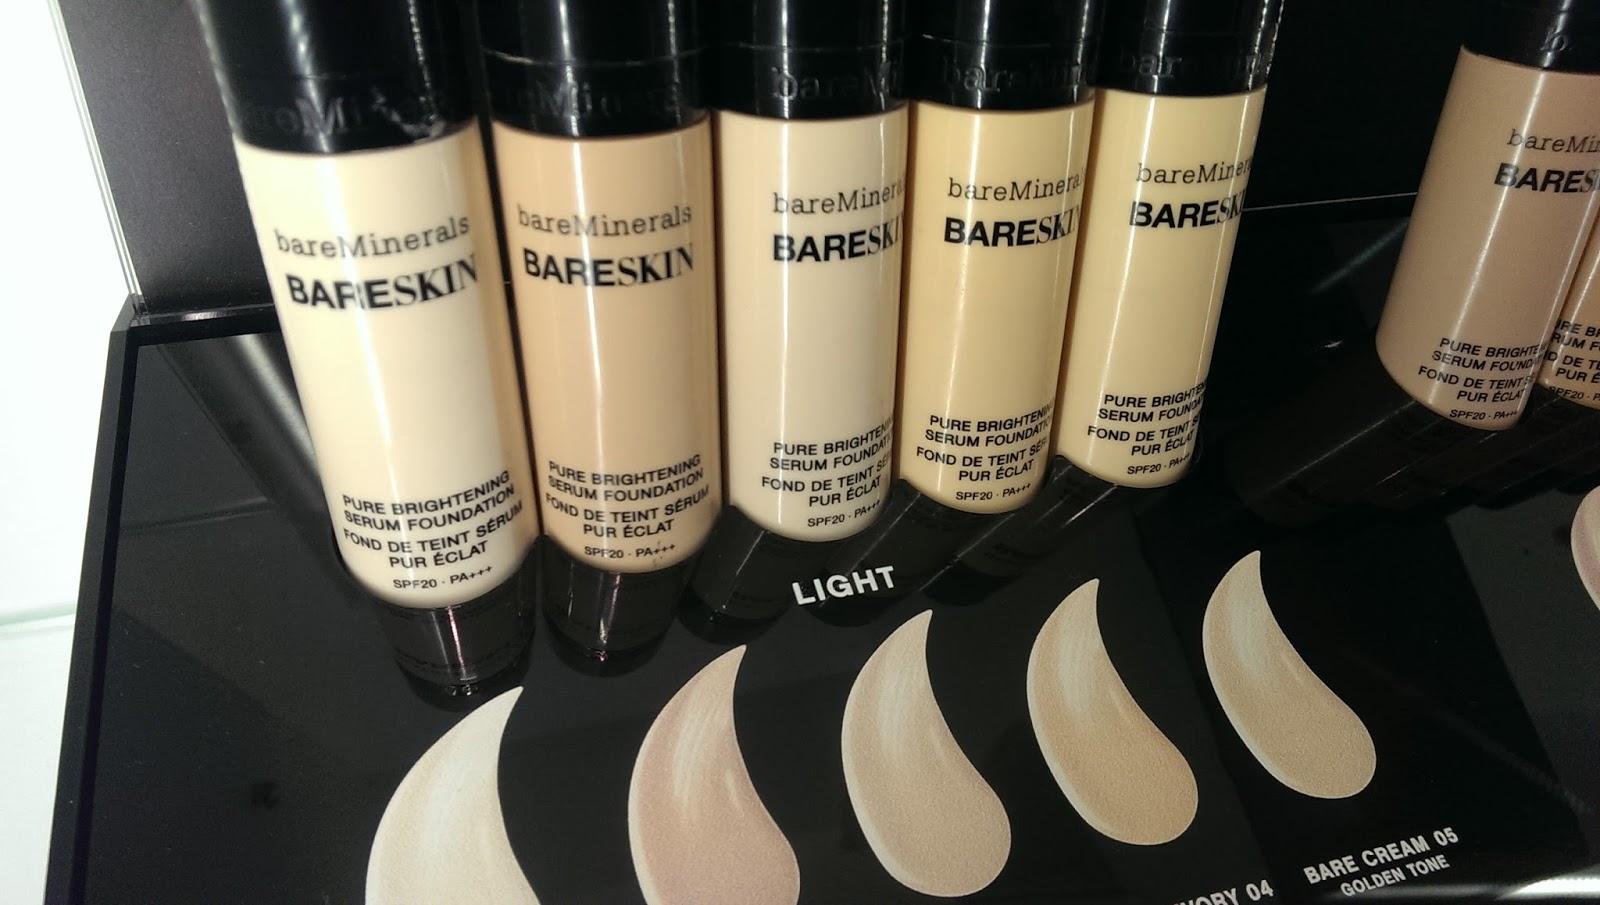 Bottles of Bare Minerals Bare Skin Display